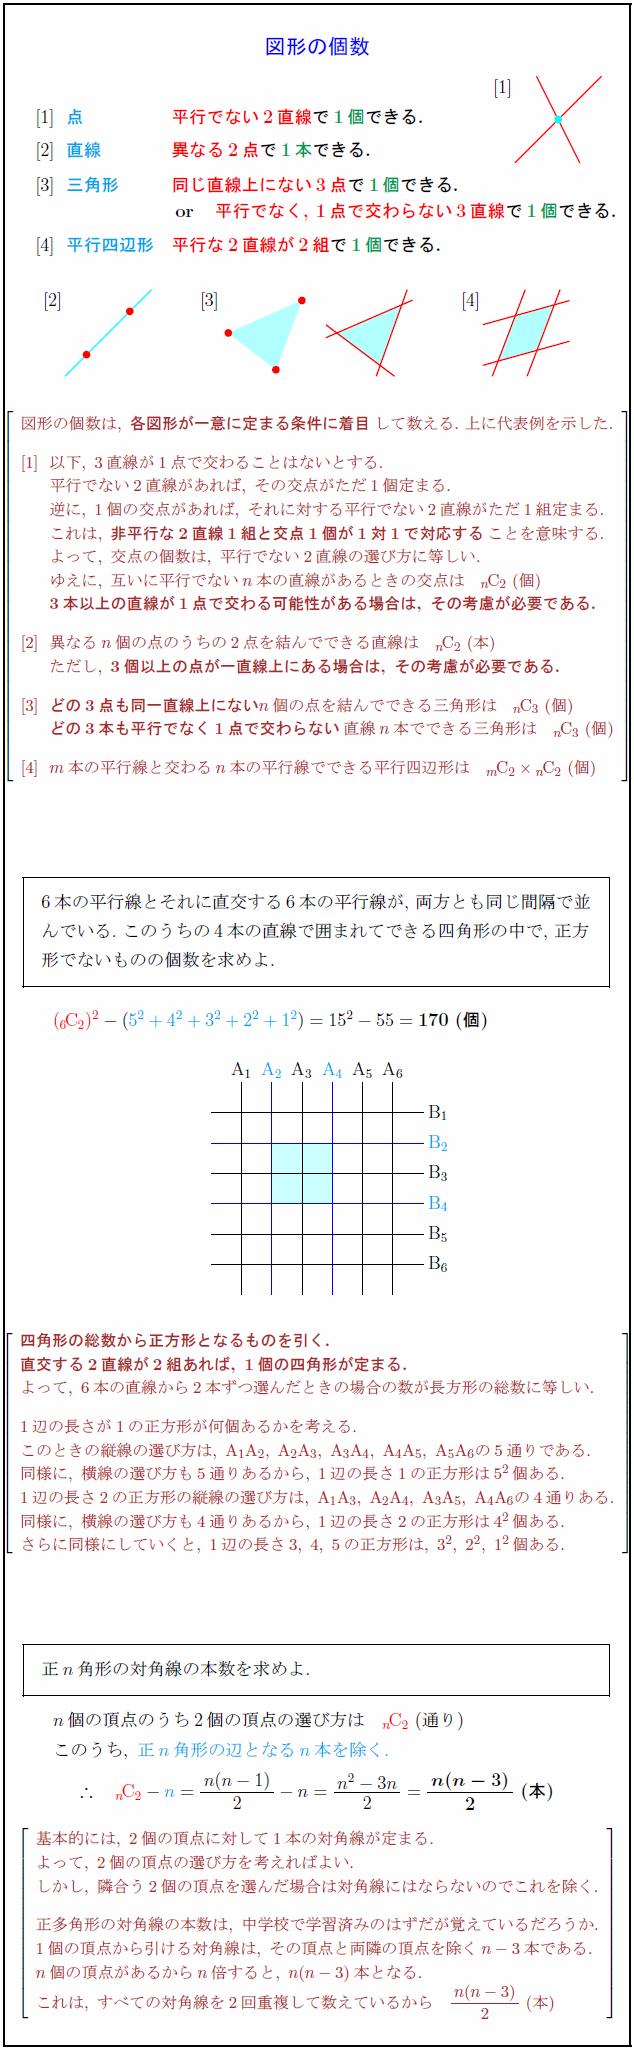 figure-number